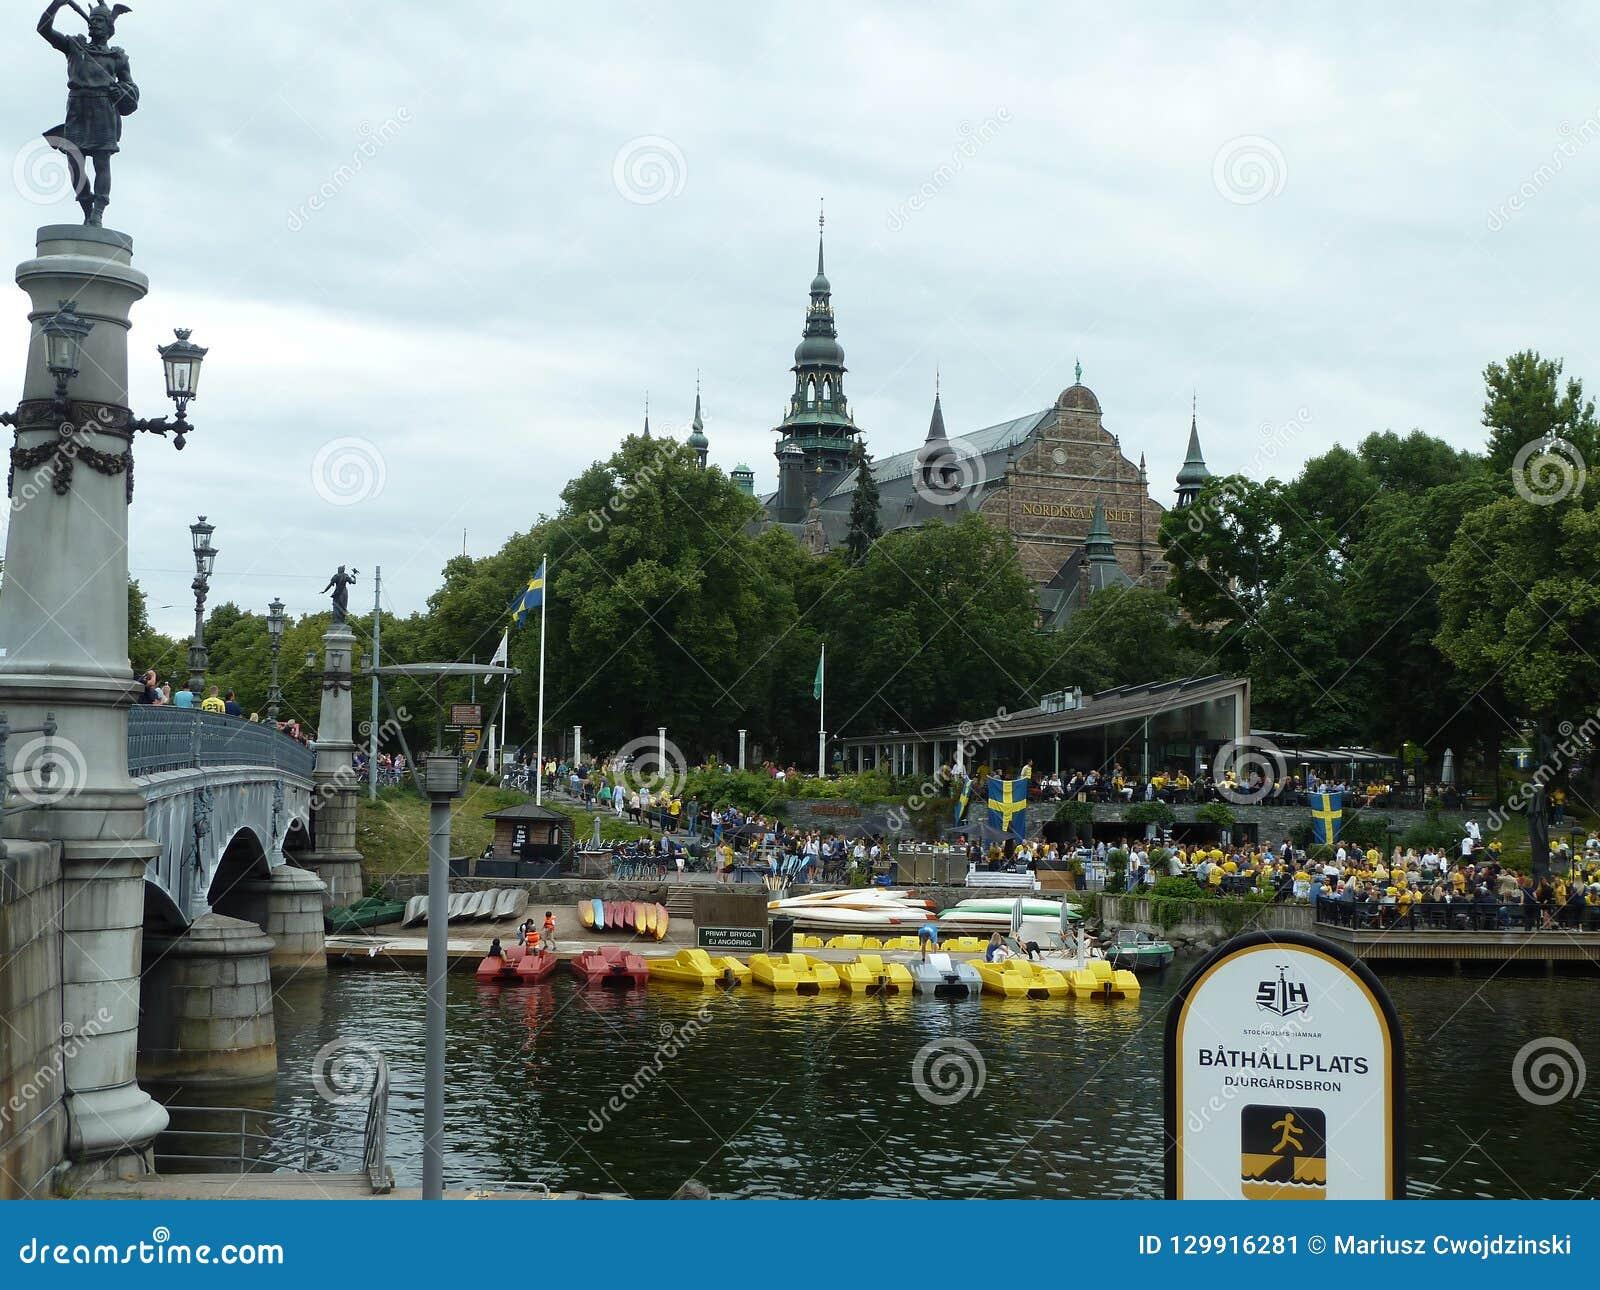 smådjur stockholm city